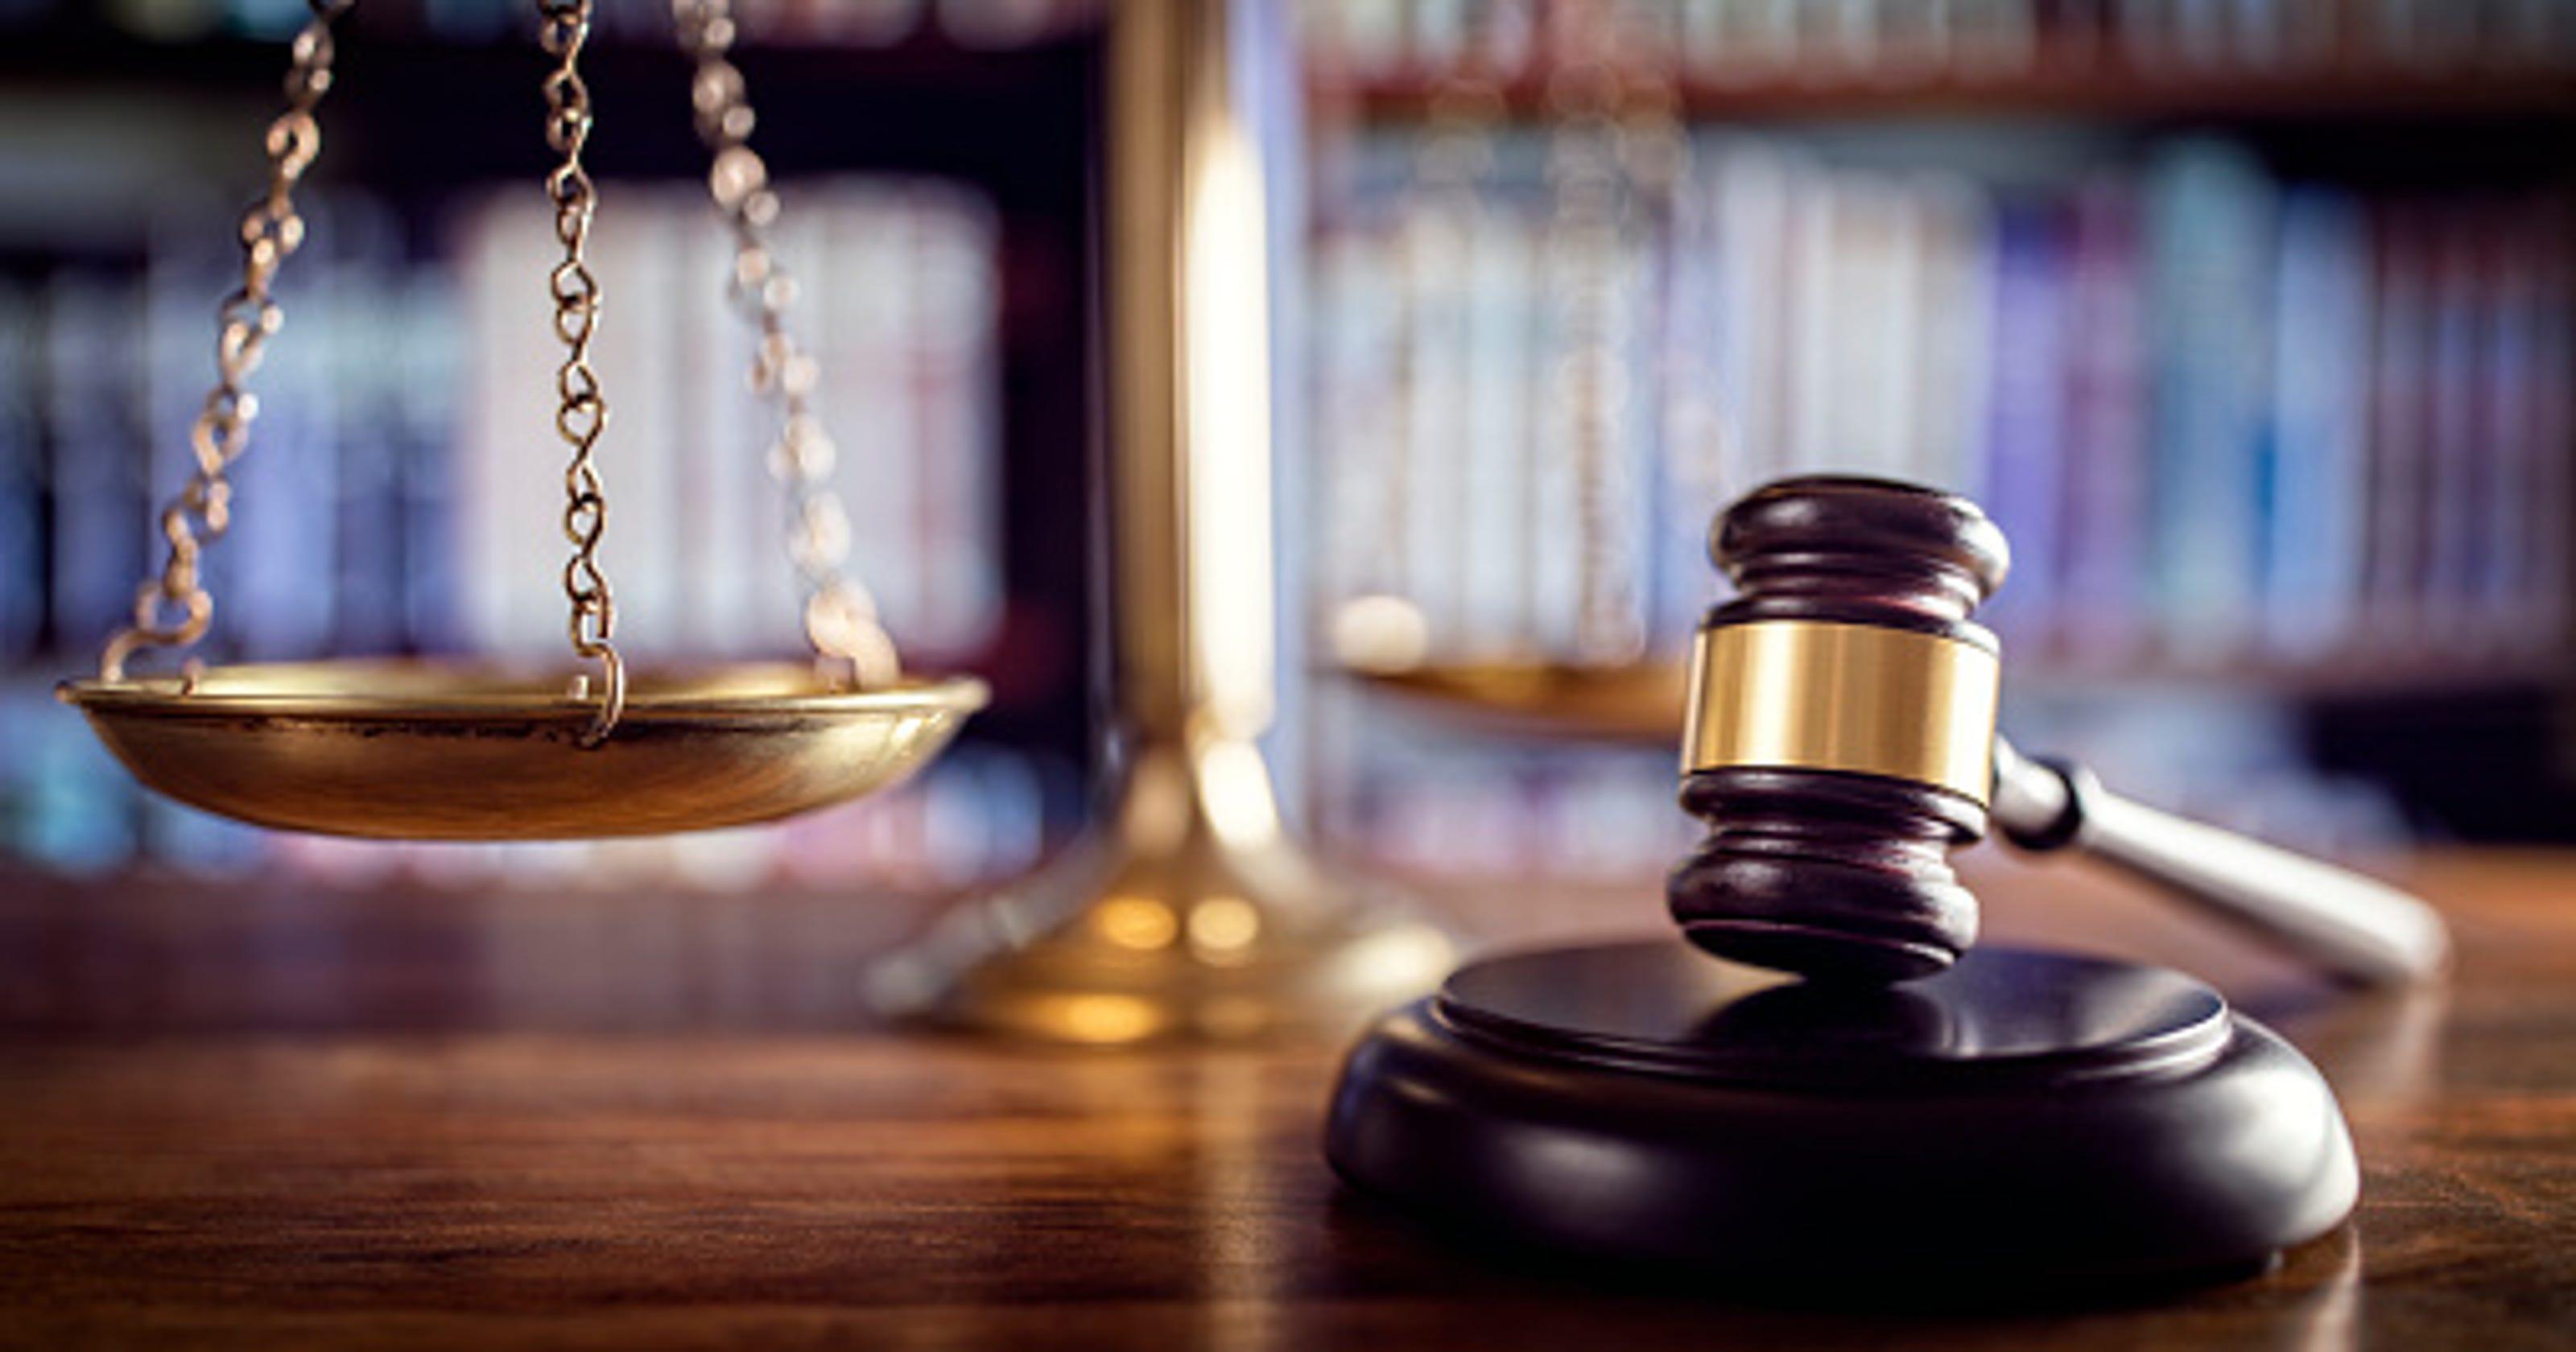 Oshkosh Central Credit Union bookkeeper gets prison for